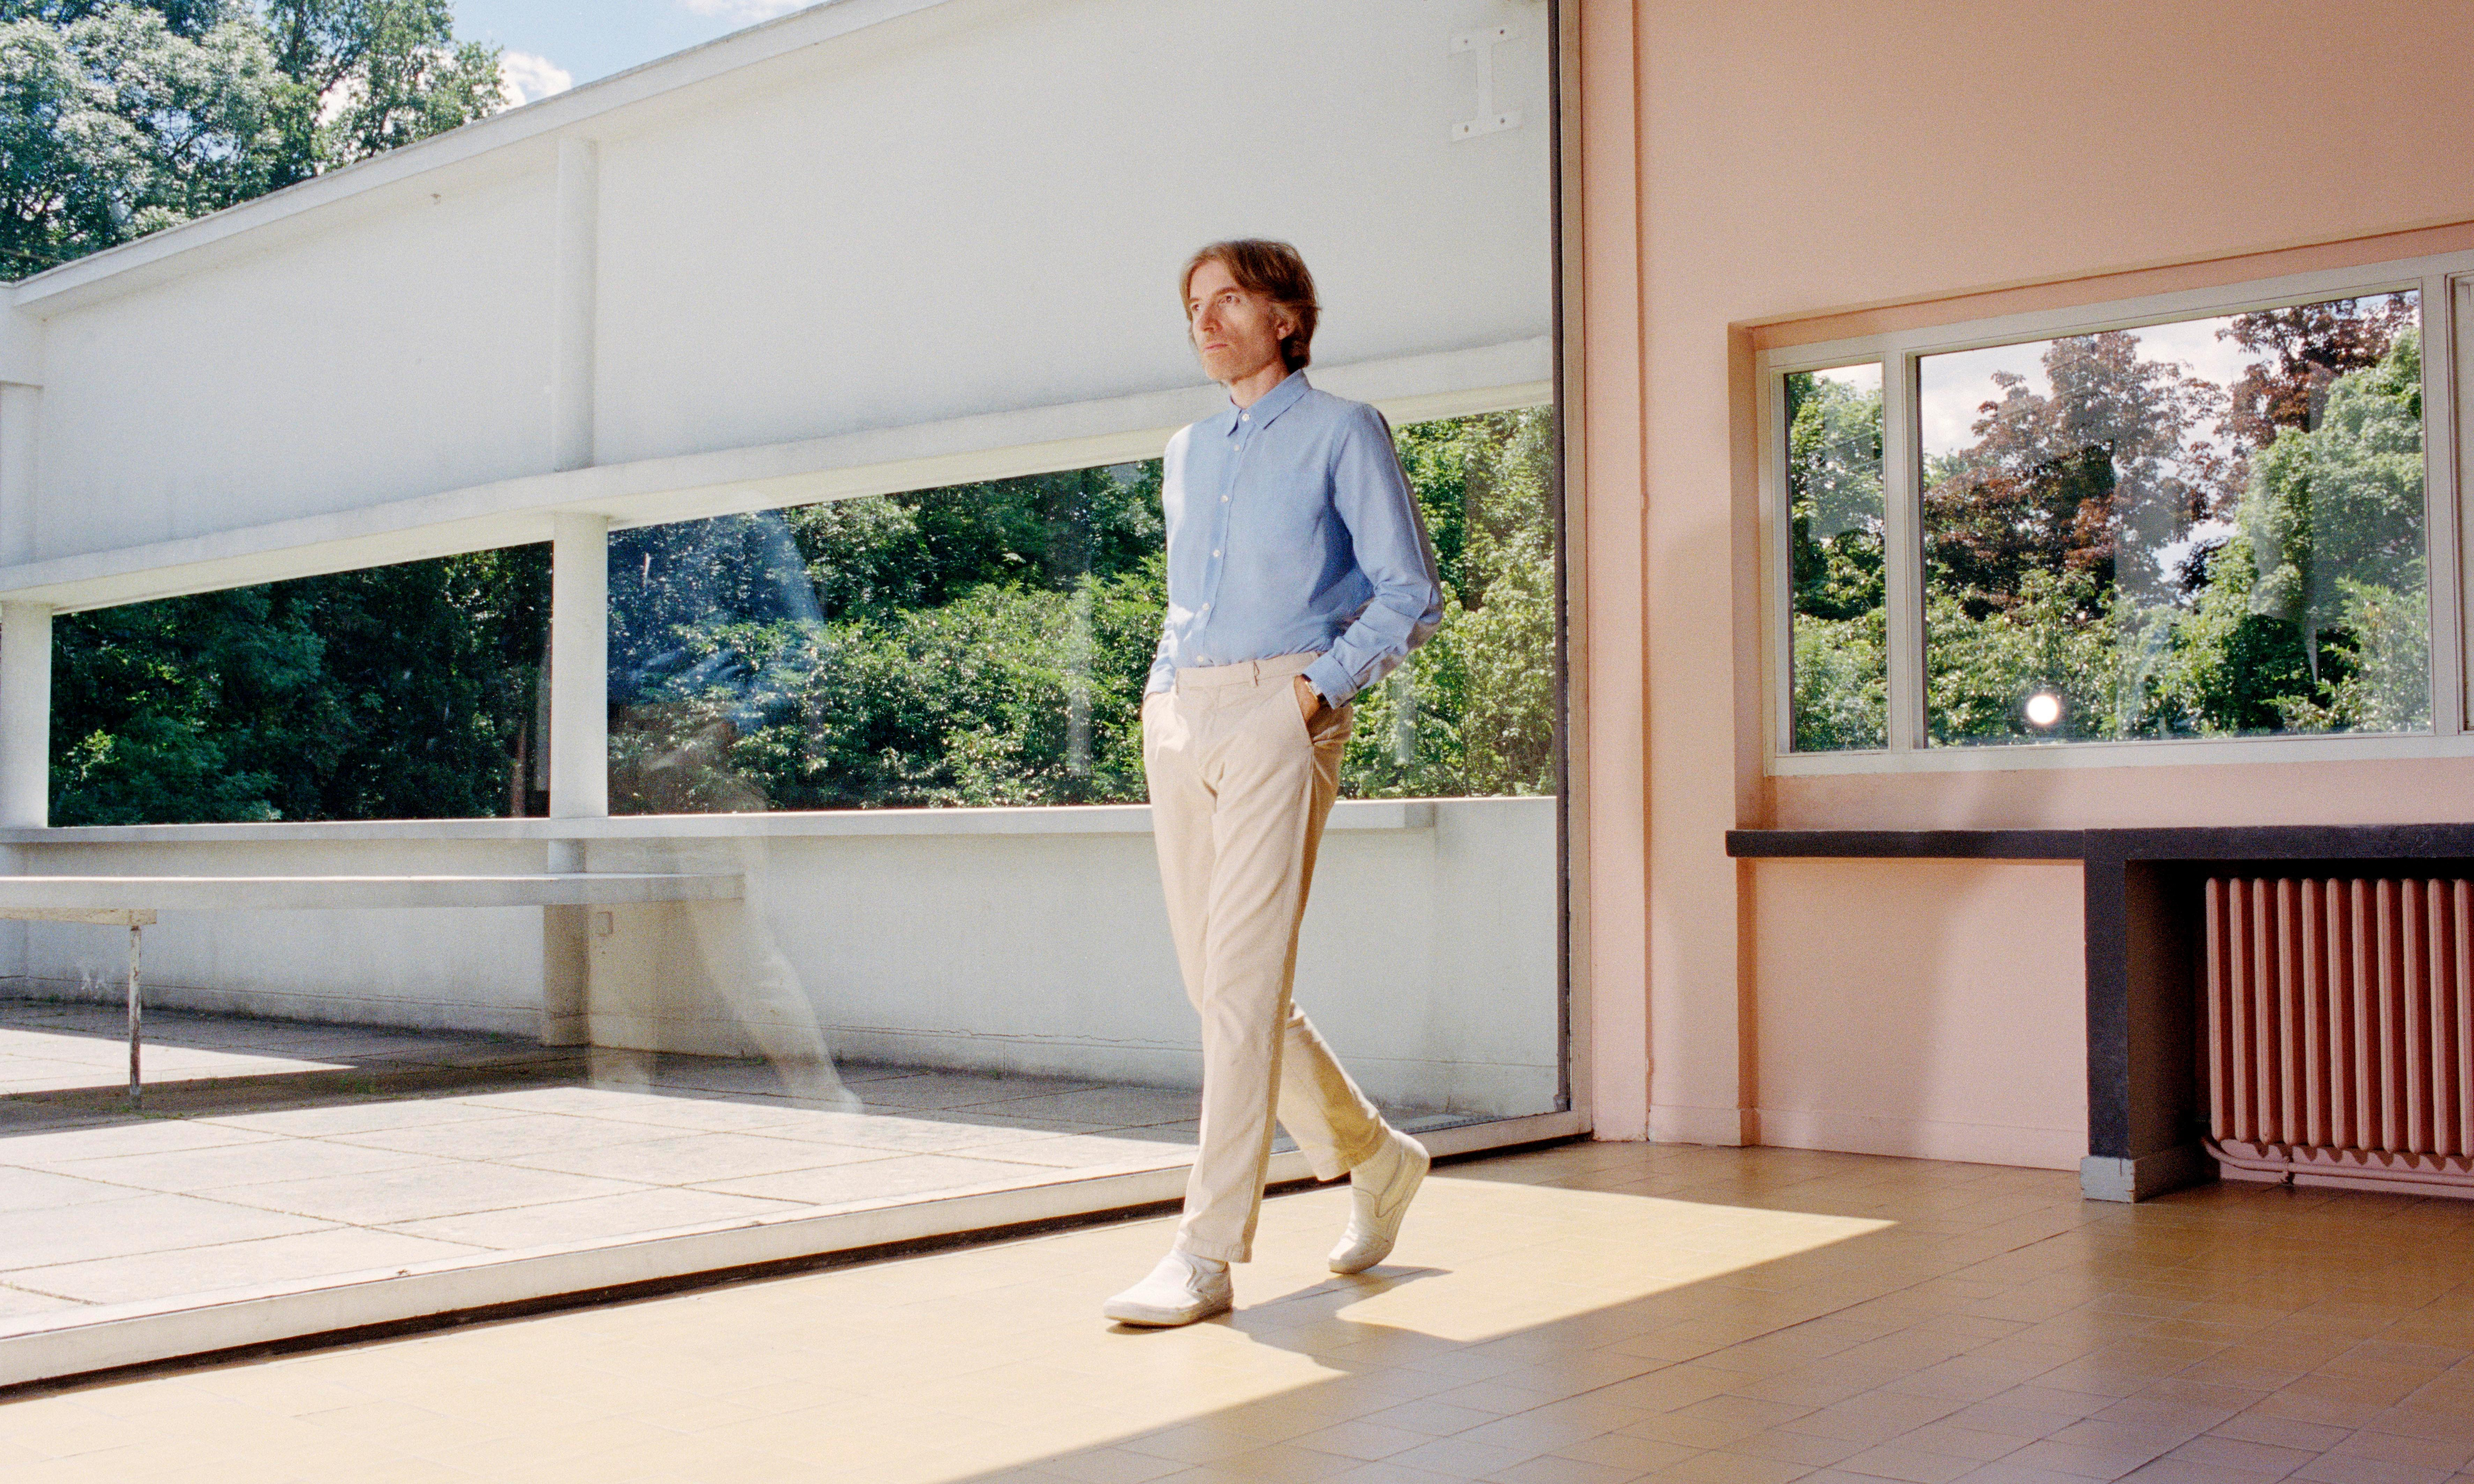 Nicolas Godin: Concrete and Glass review